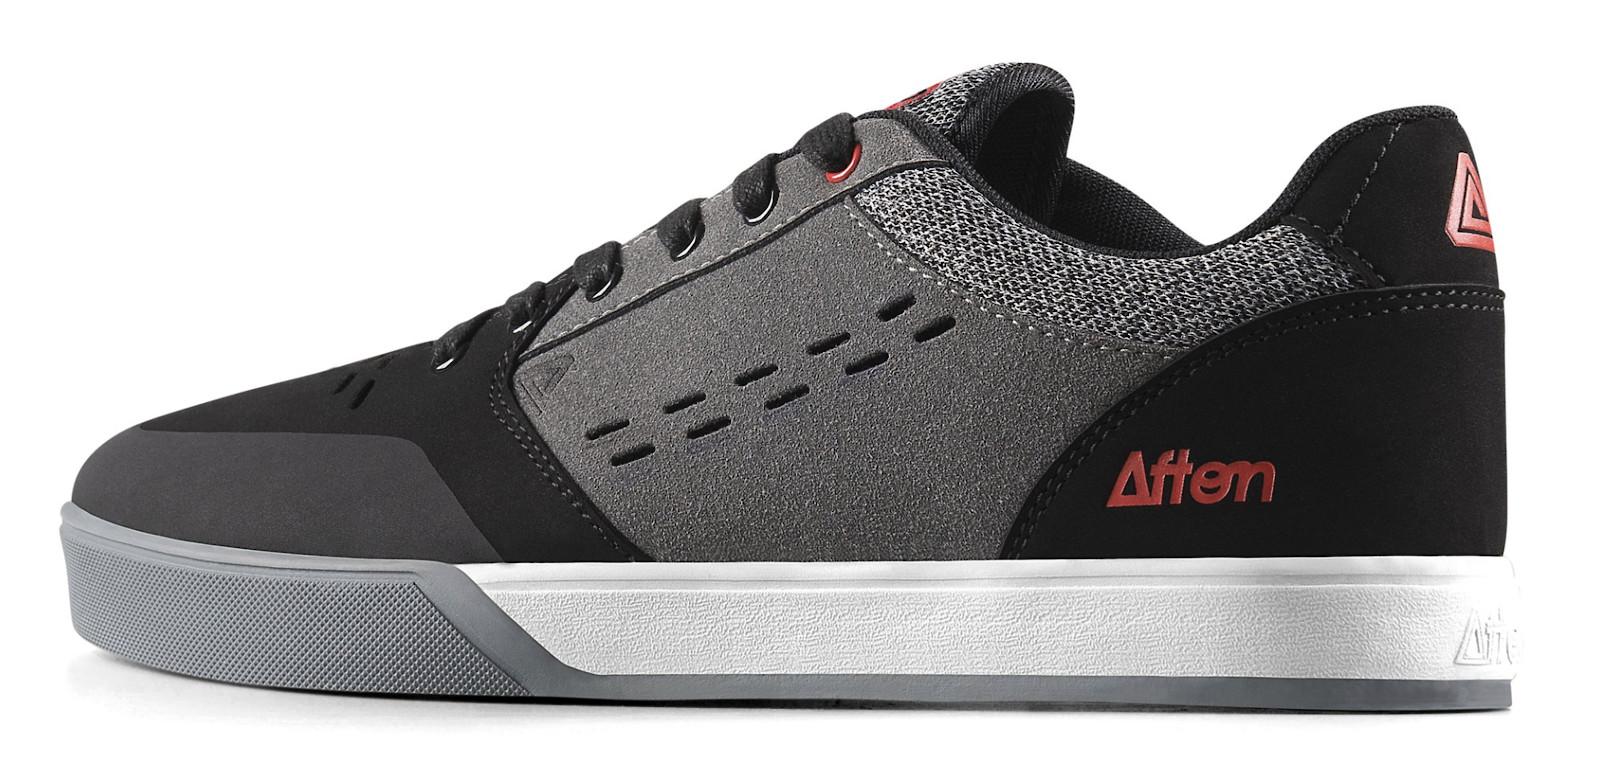 Keegan Grey/Red $99.99 - Afton Shoes - Mountain Biking Pictures - Vital MTB